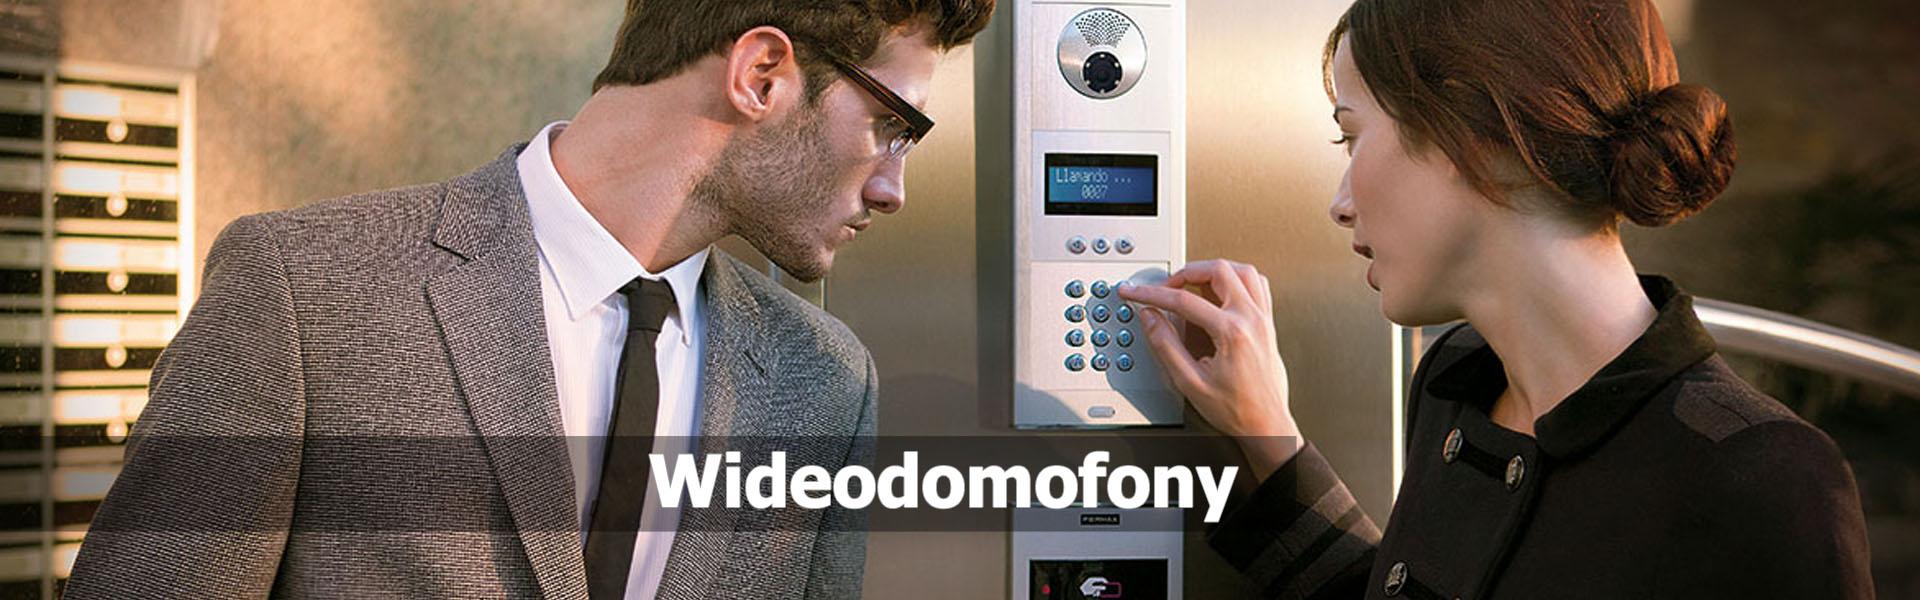 wideodomofony